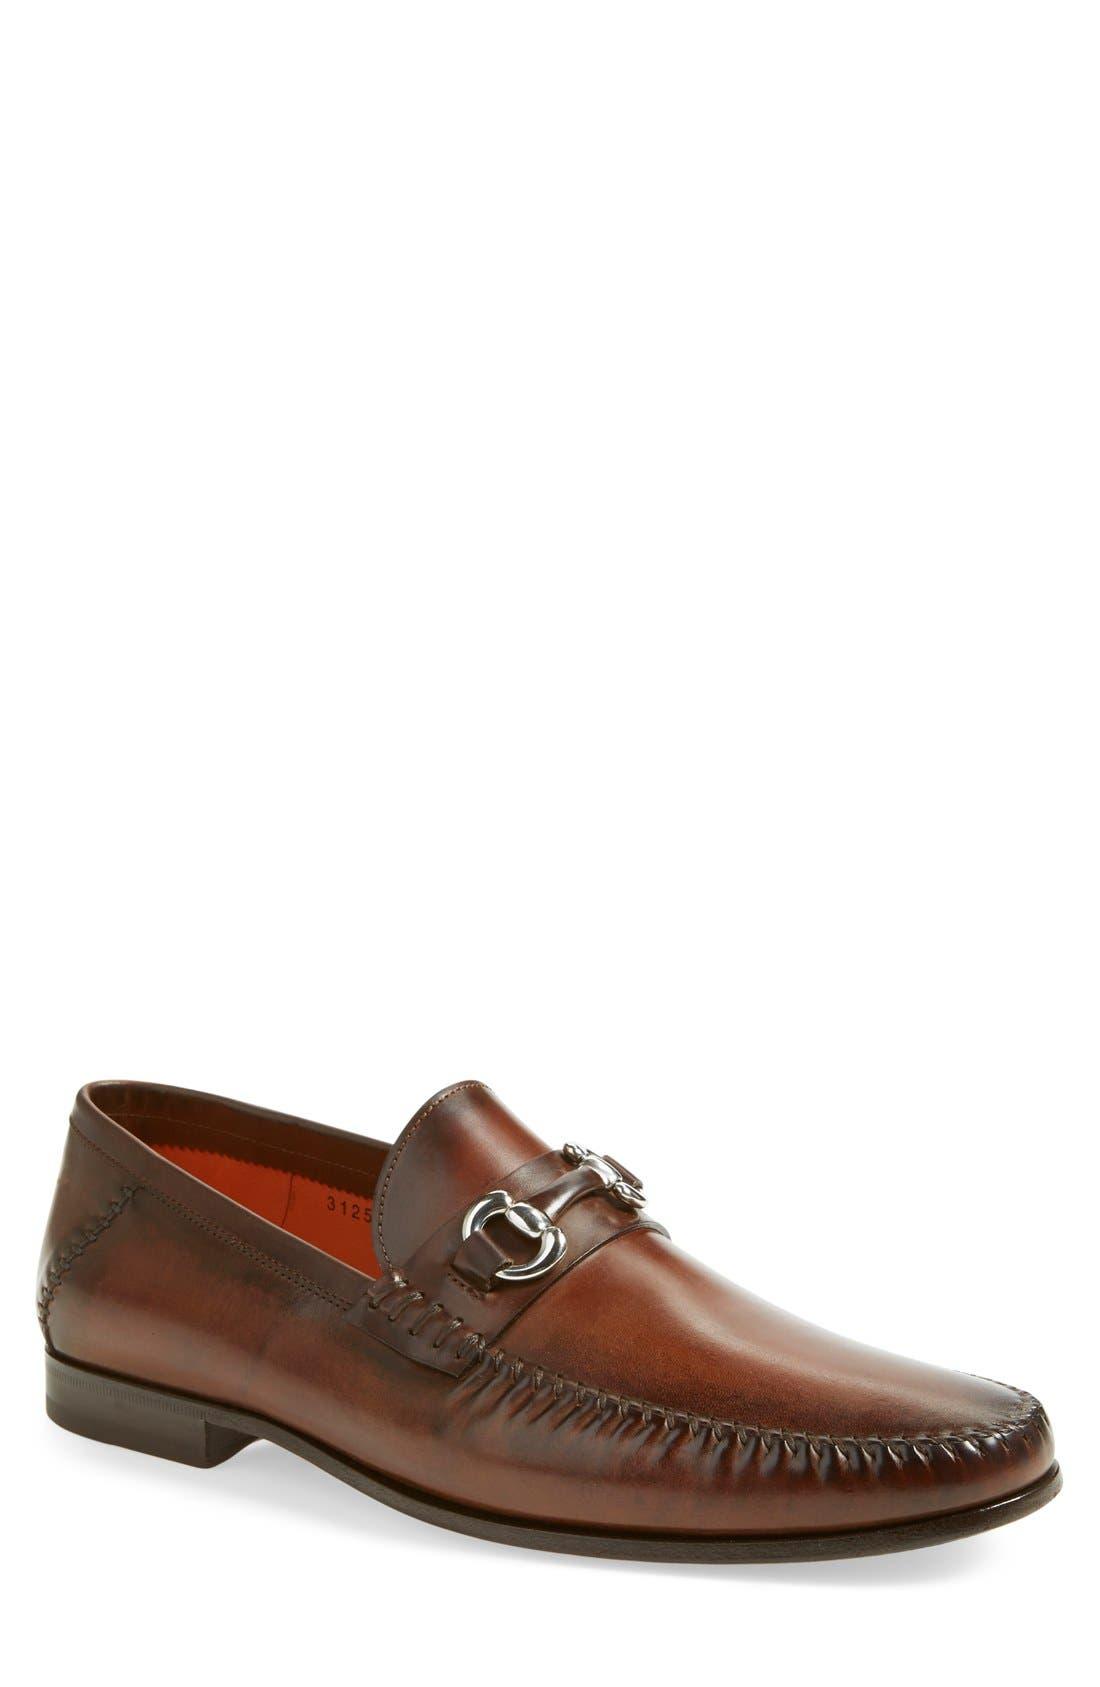 'Egan' Bit Loafer,                             Main thumbnail 1, color,                             Brown Leather